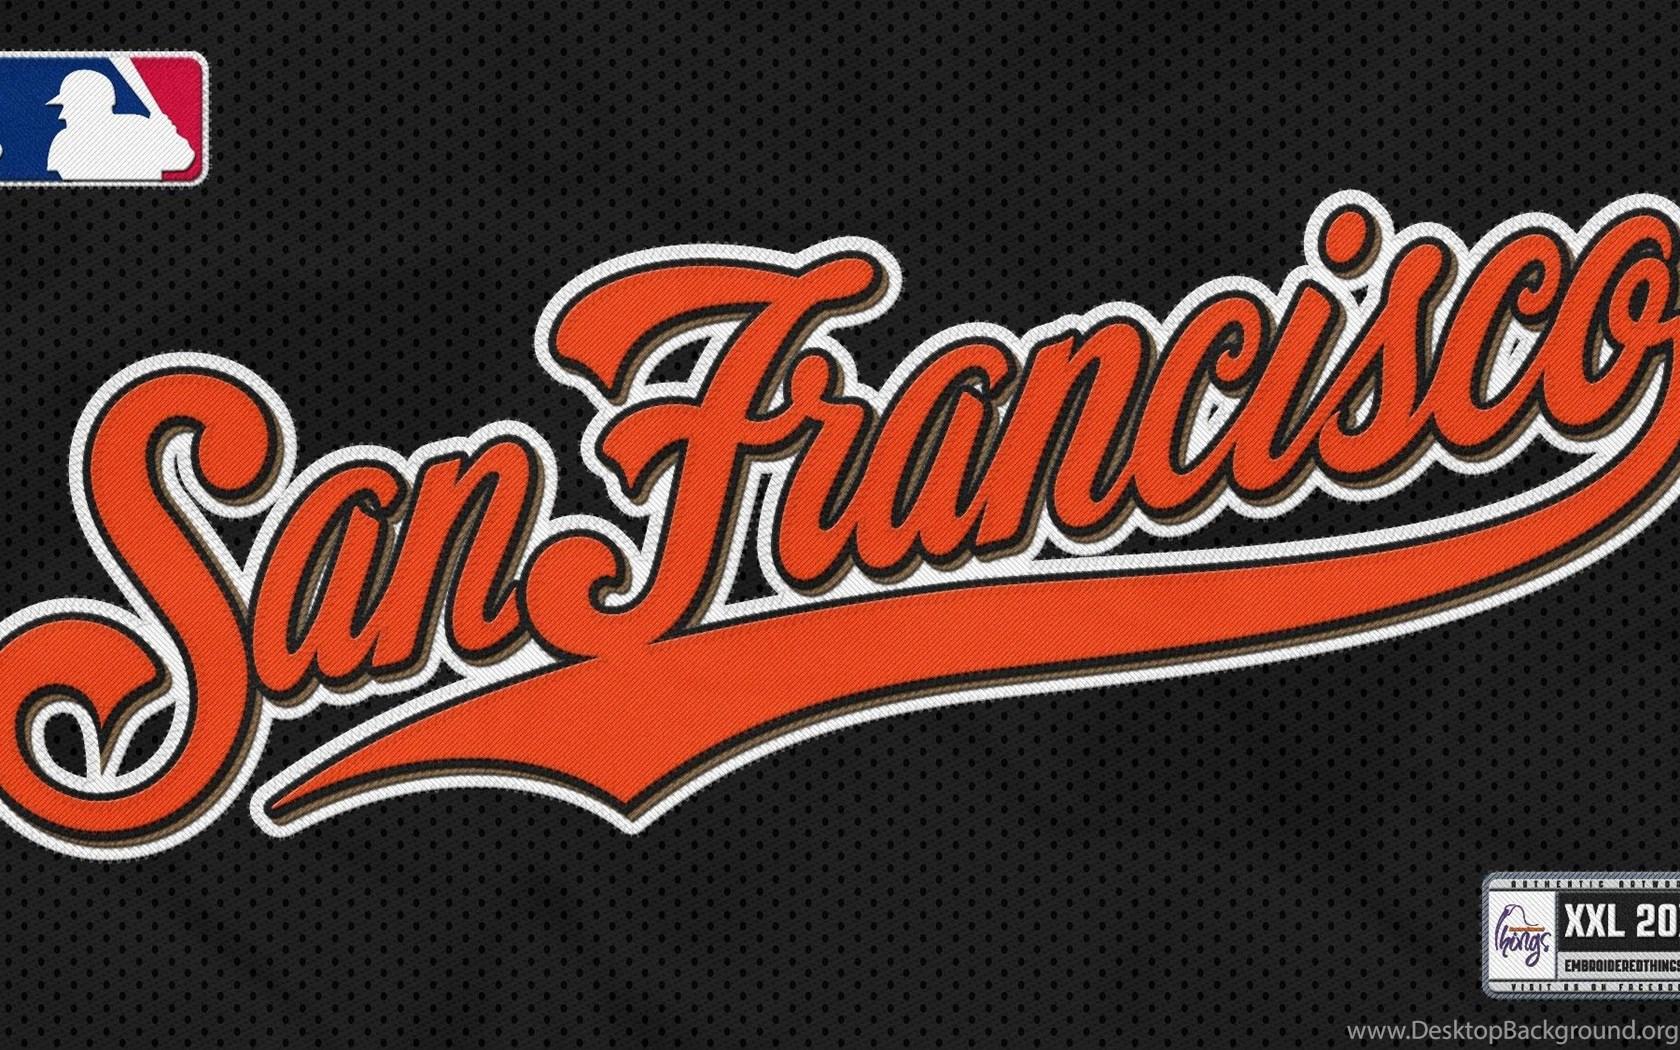 San Francisco Giants Wallpapers Wallpapers Zone Desktop Background